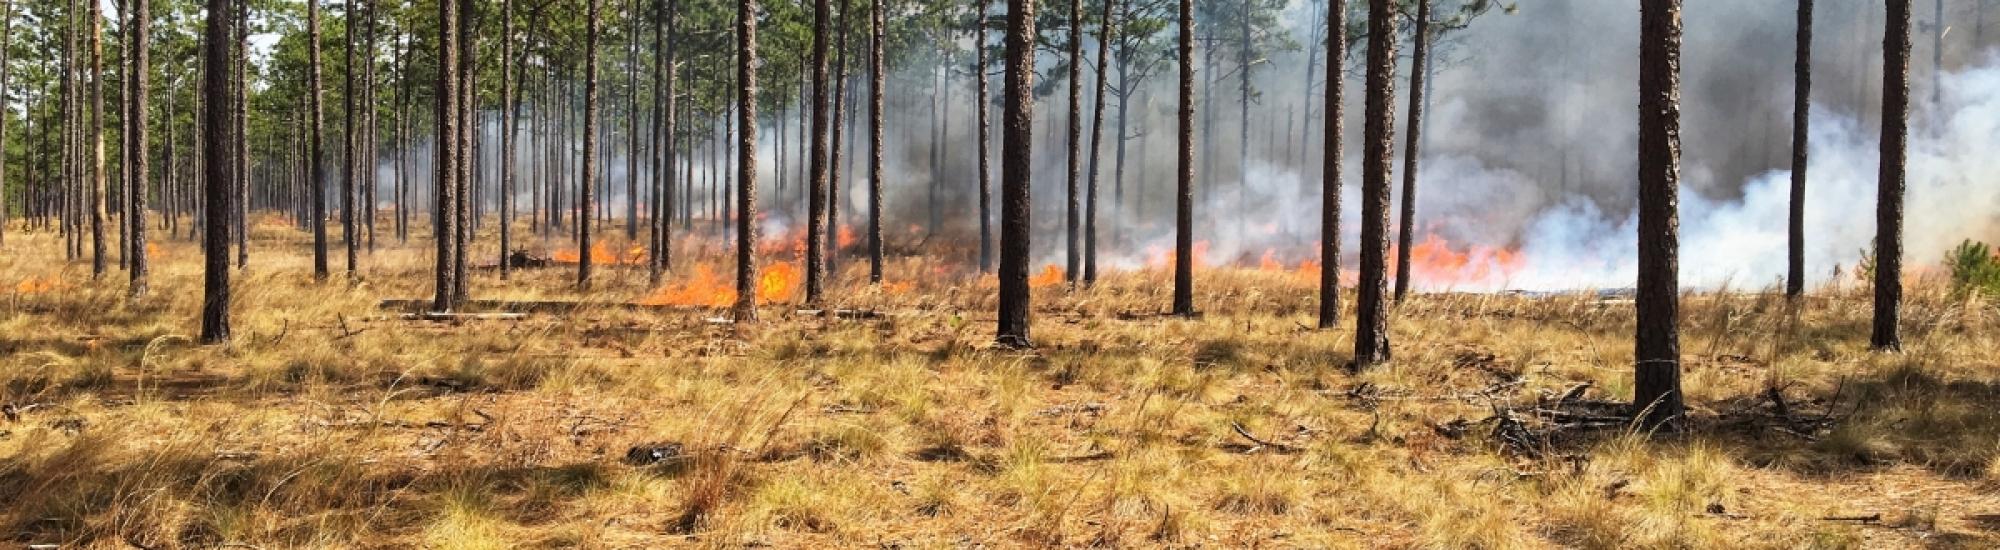 Field burning